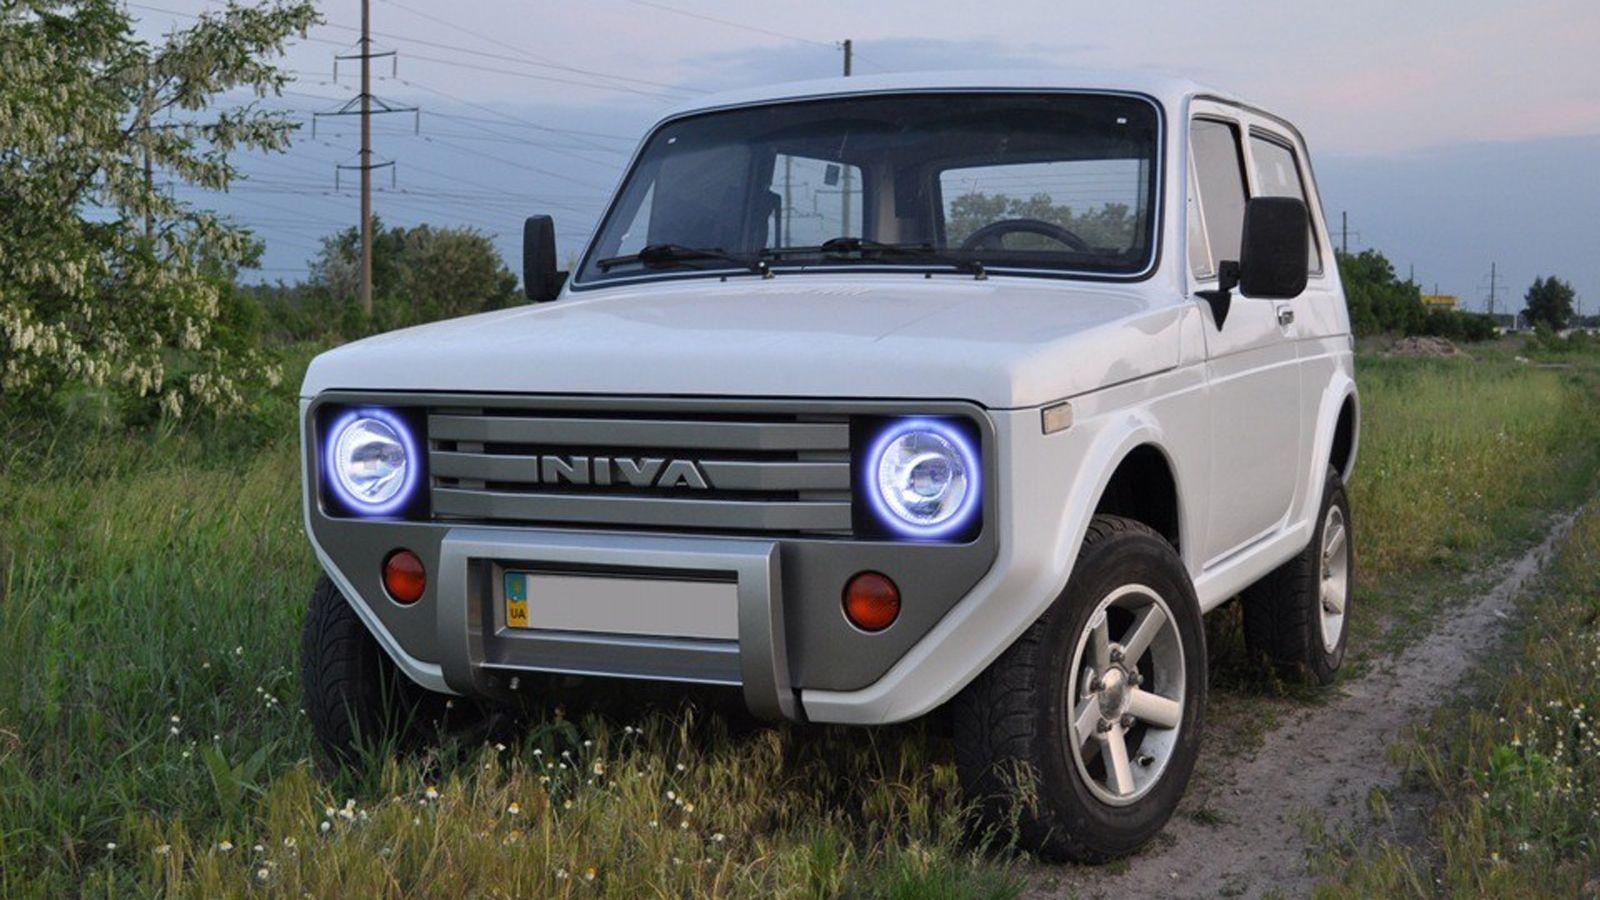 Niva Lada Niva 4x4